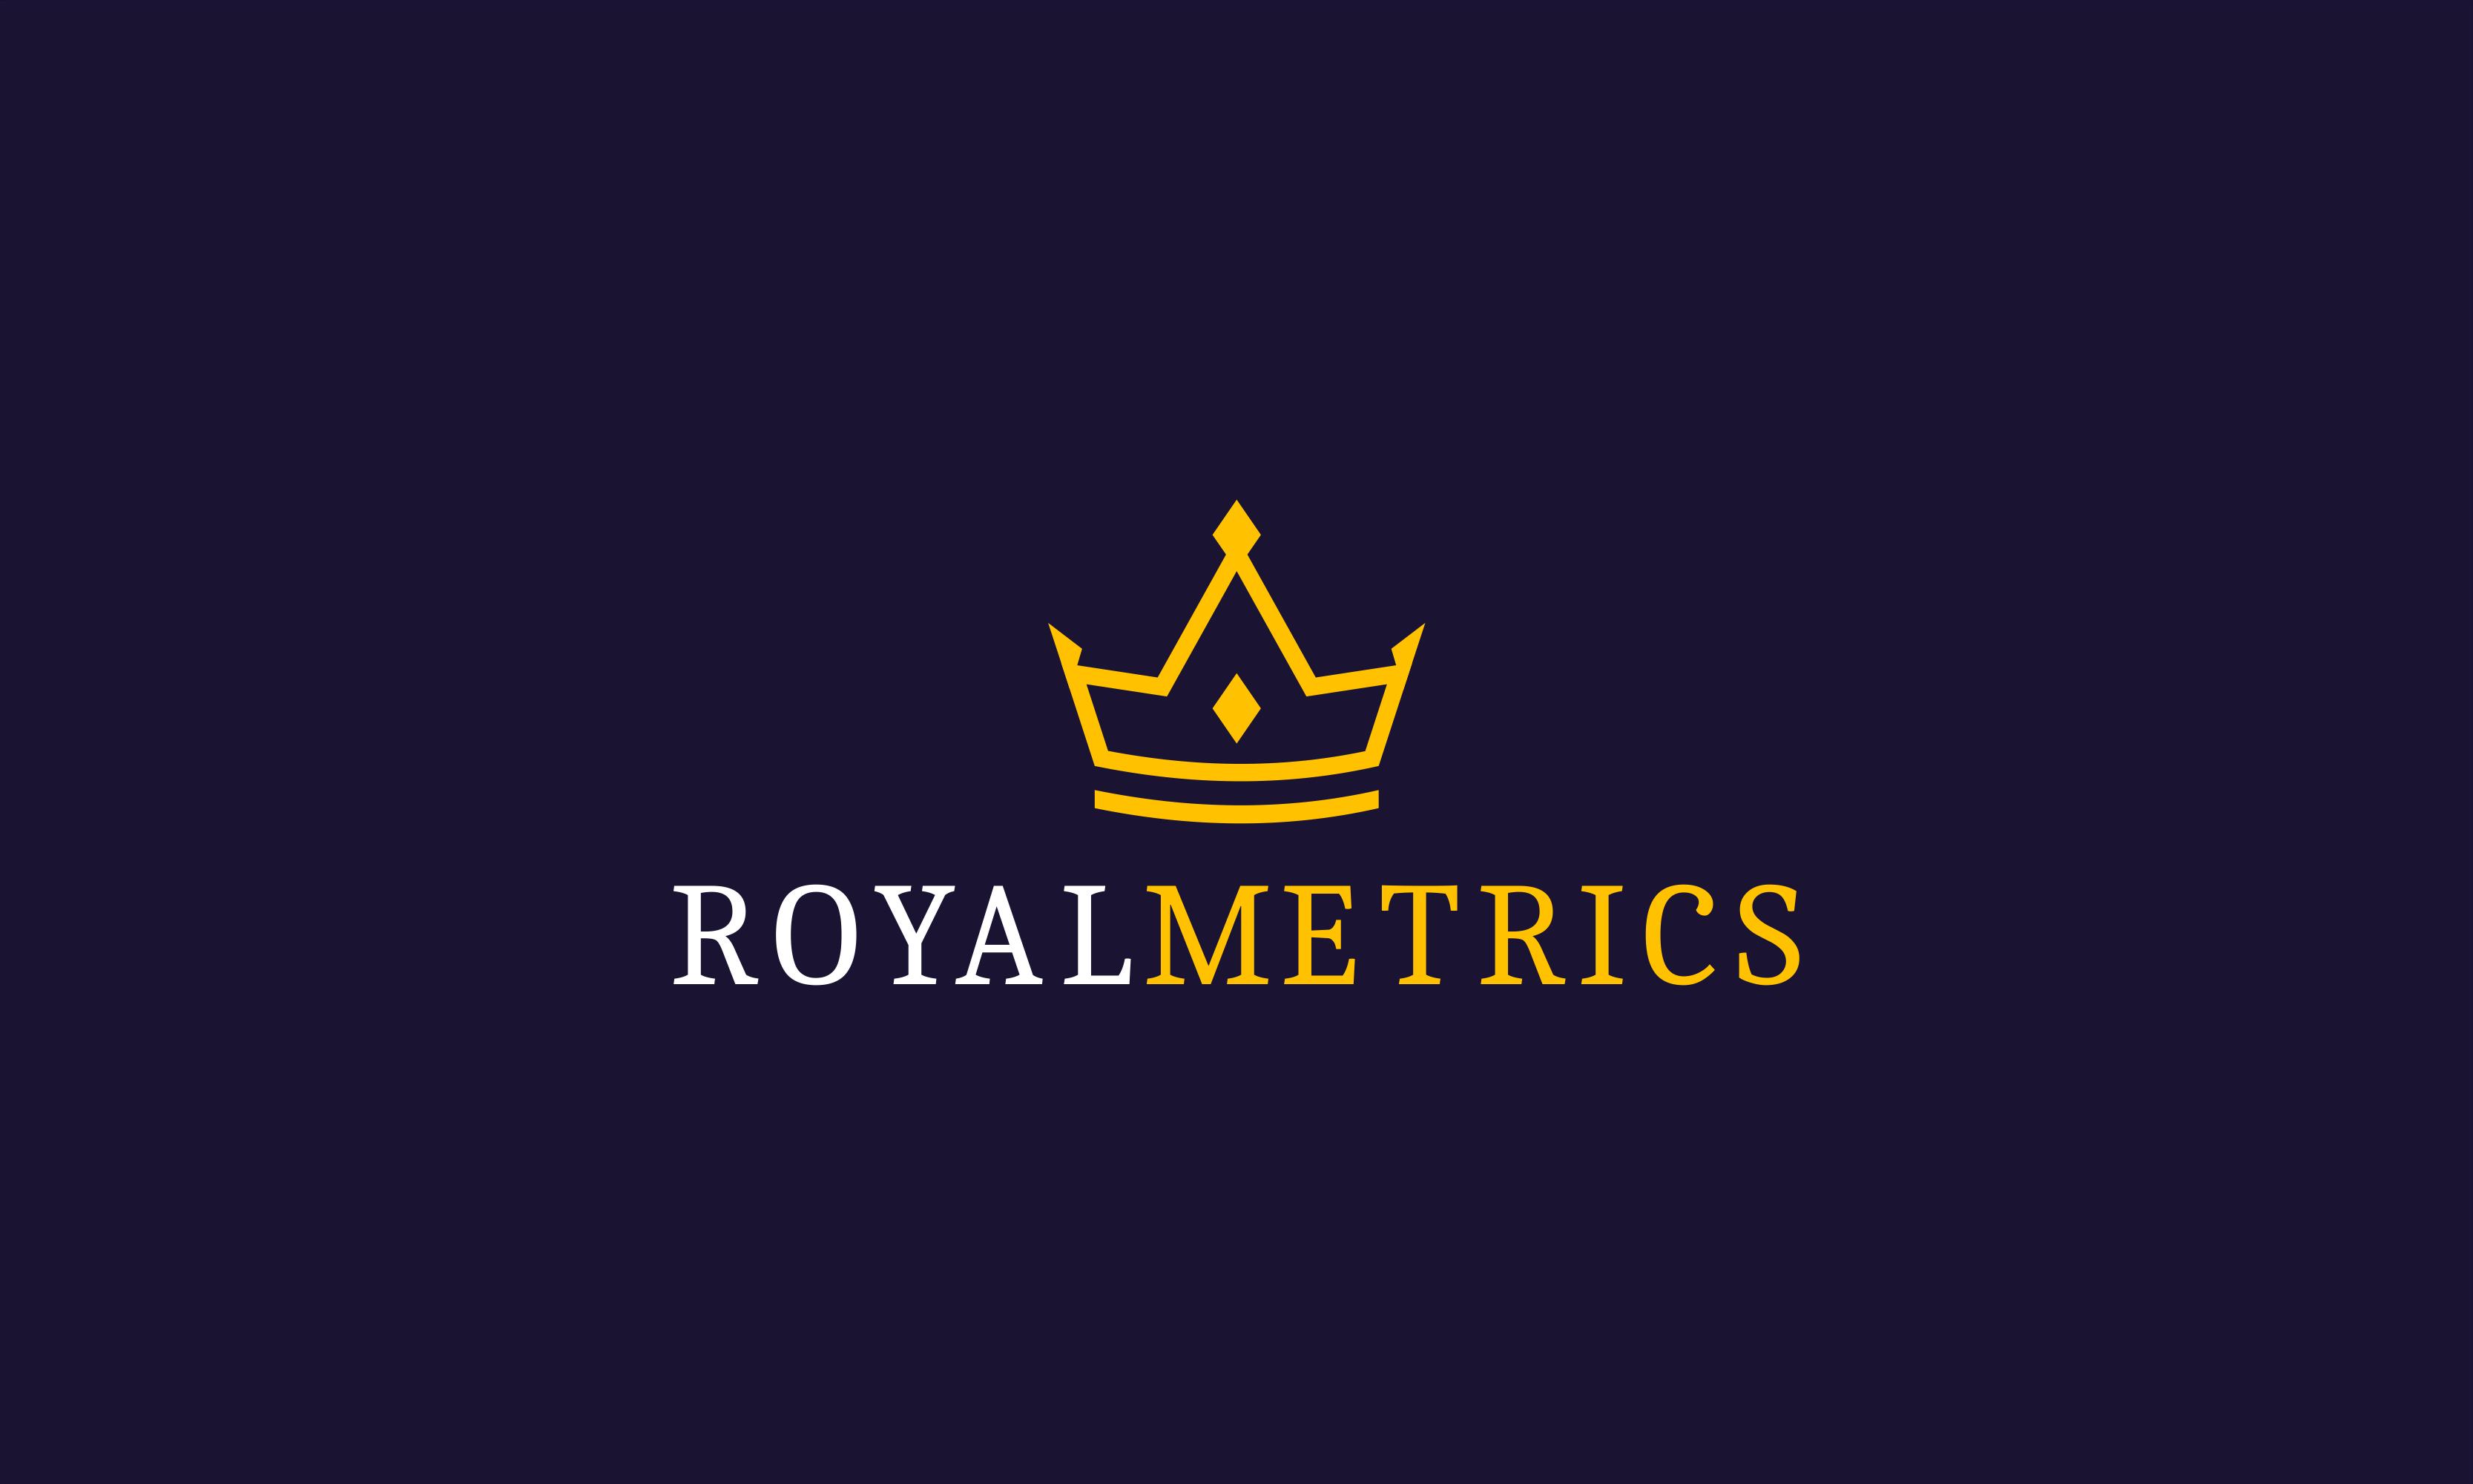 Royalmetrics